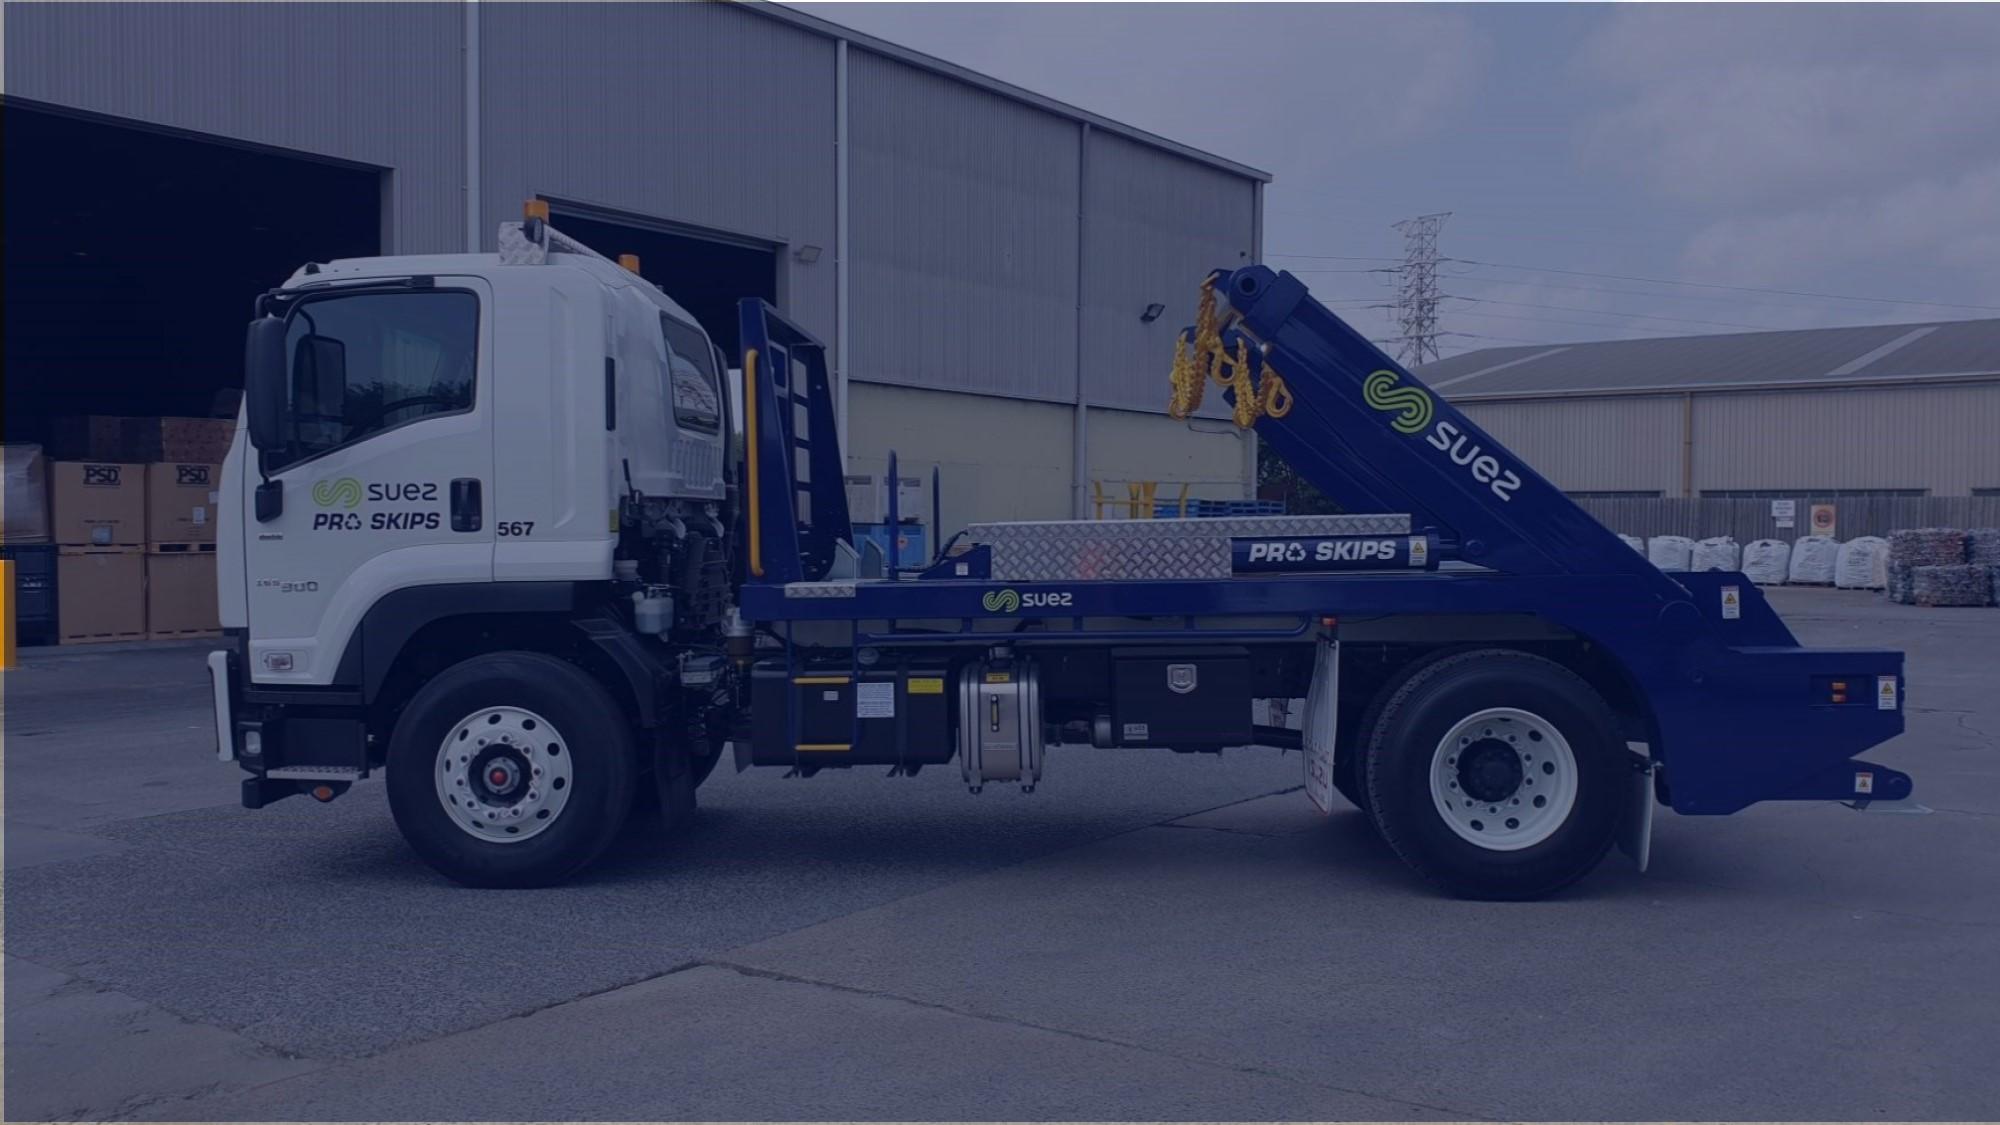 SUEZ Proskips header truck unloaded 1 2000x1125